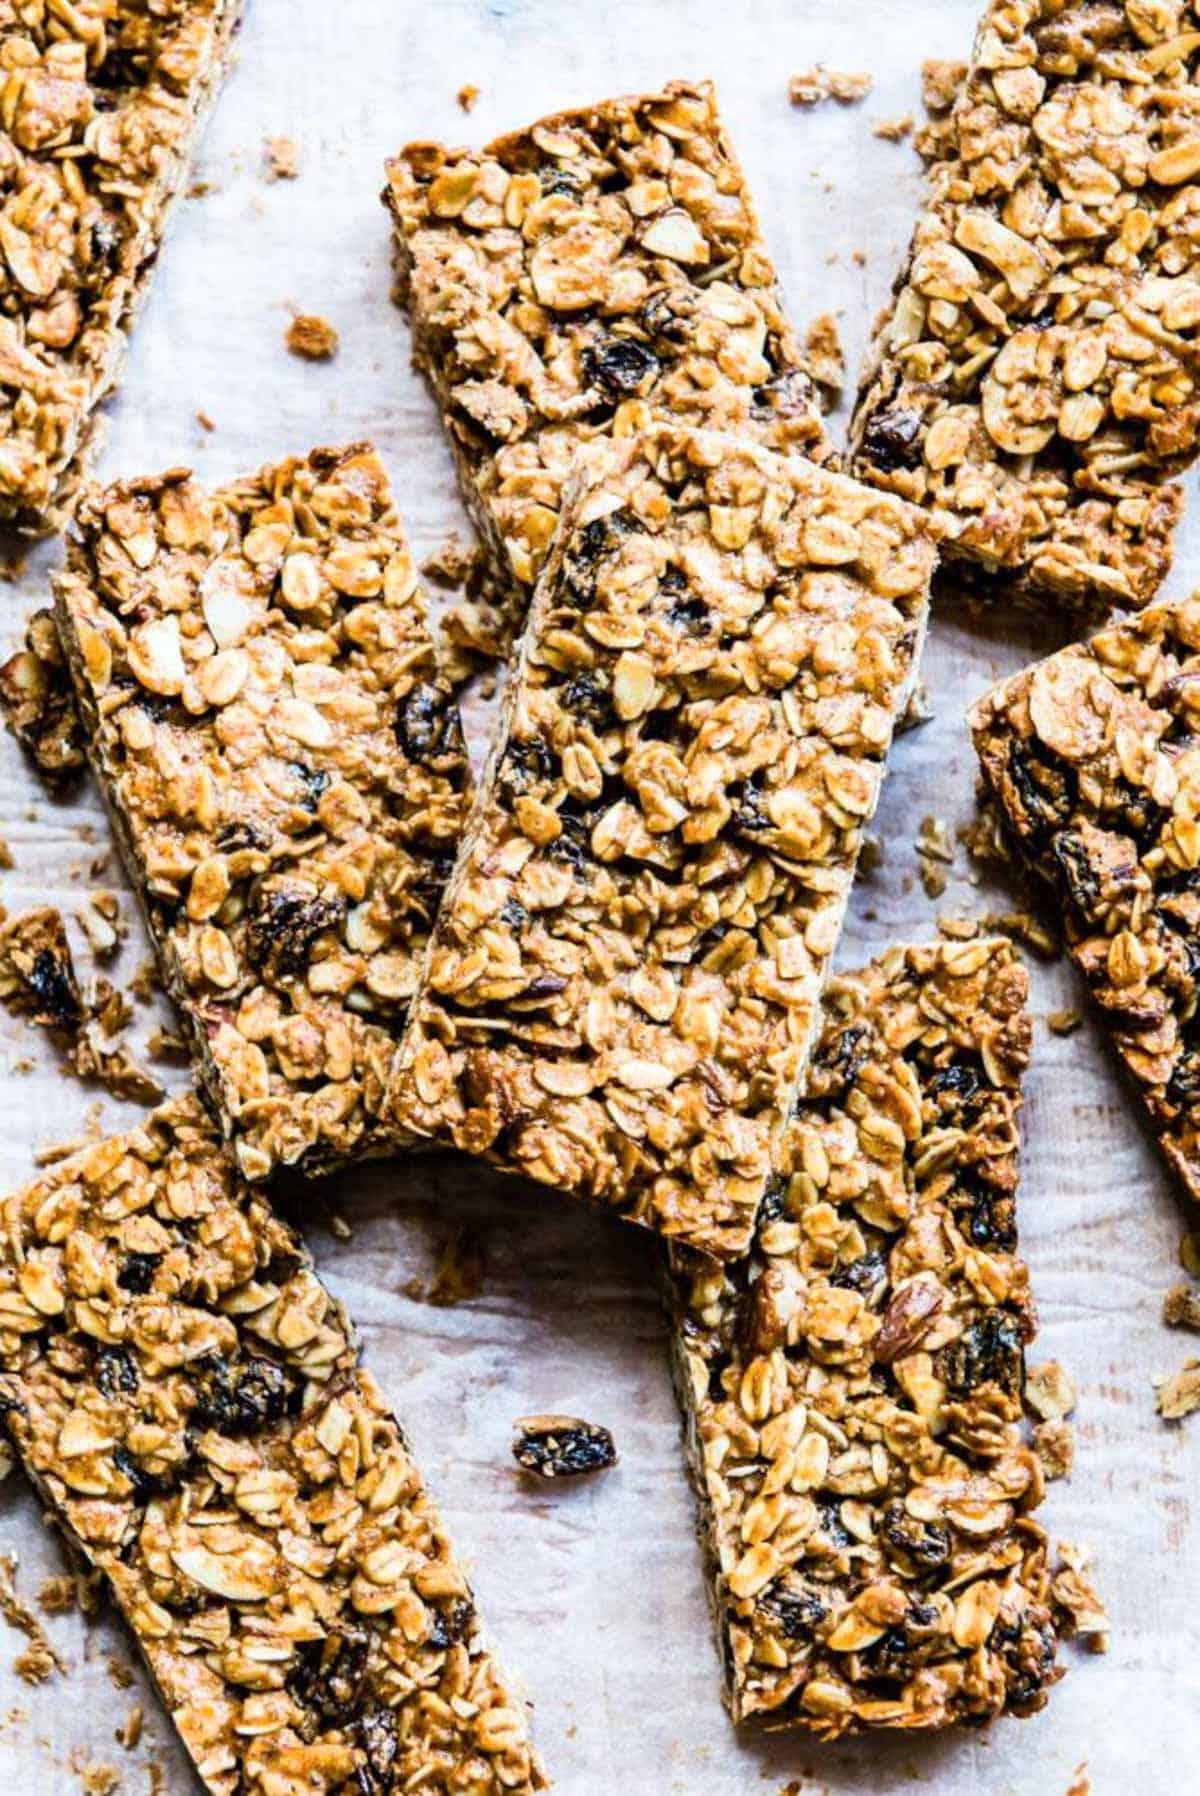 homemade granola bars with oats